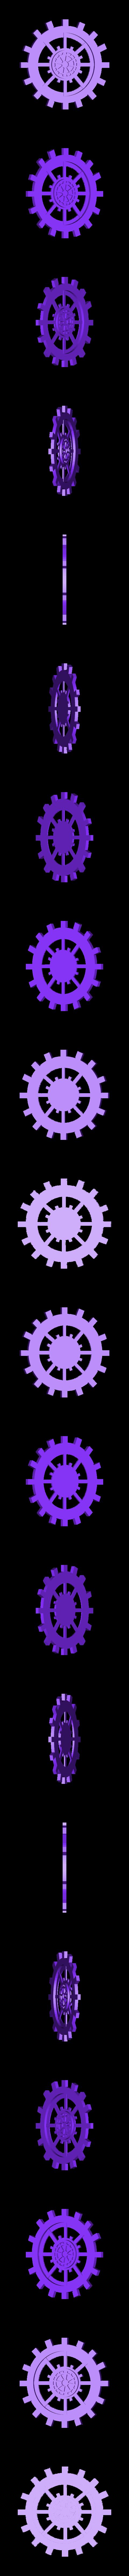 grand engrenage modif.stl Download STL file gear decoration • 3D printer template, catf3d